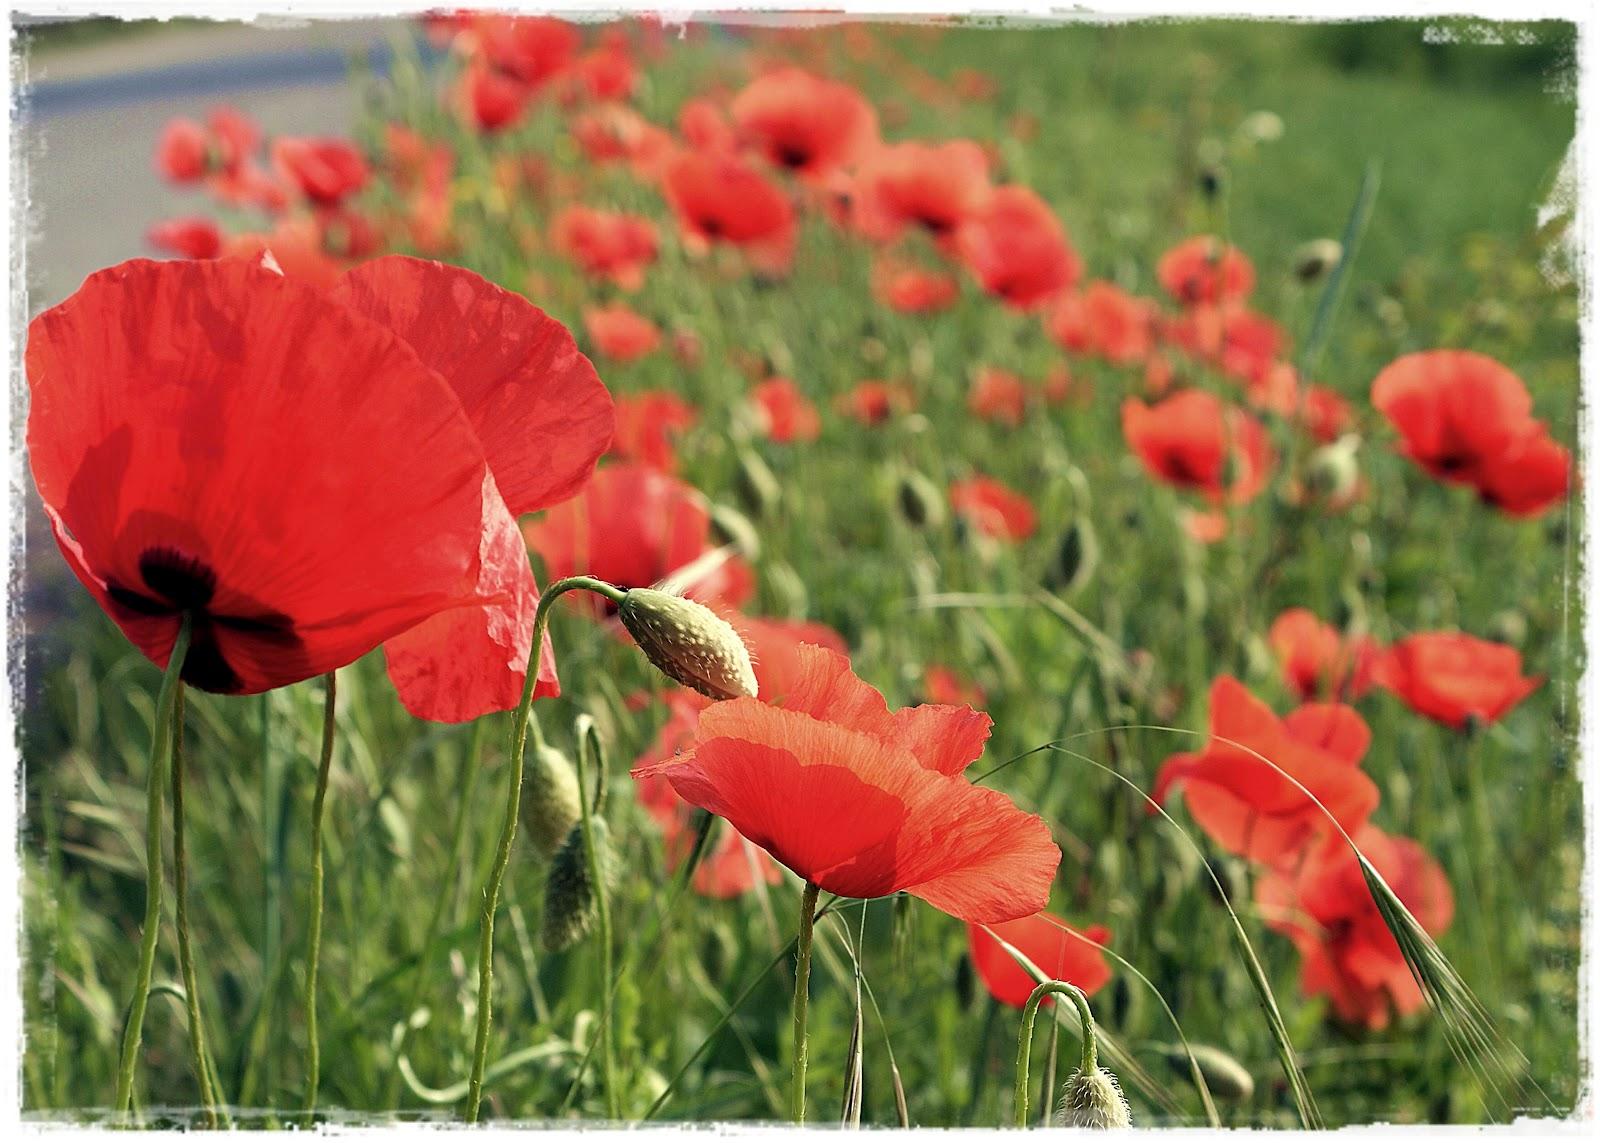 Creative Compulsive: Red Poppy Love